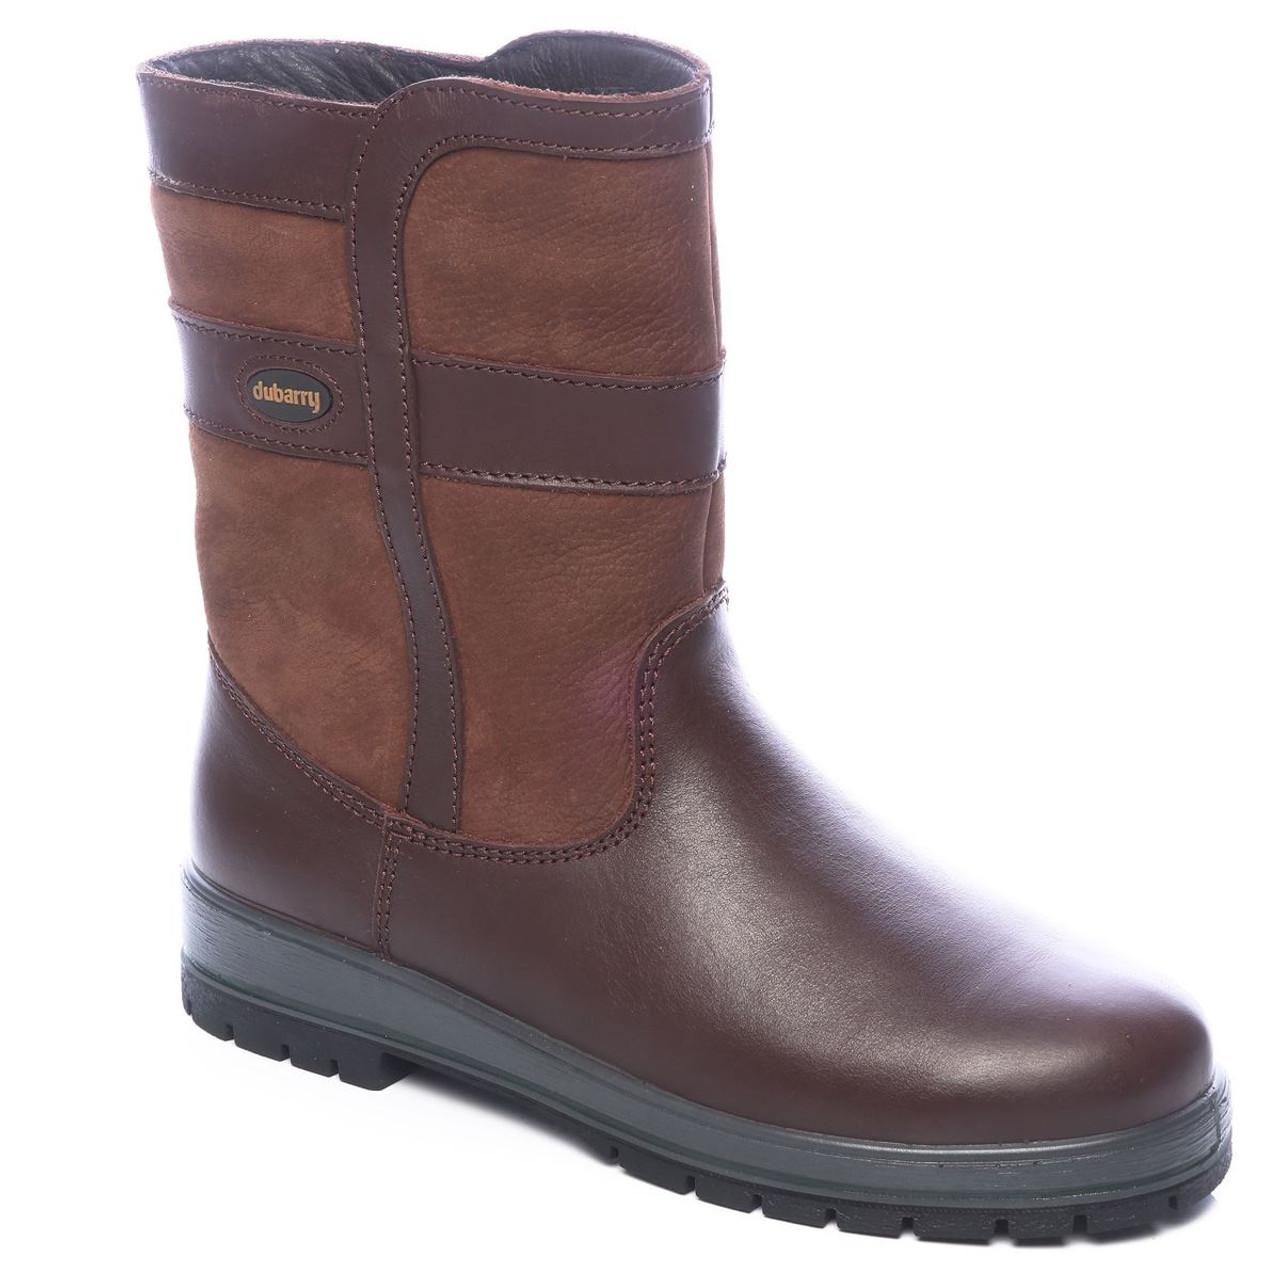 Dubarry Roscommon Boots in Walnut